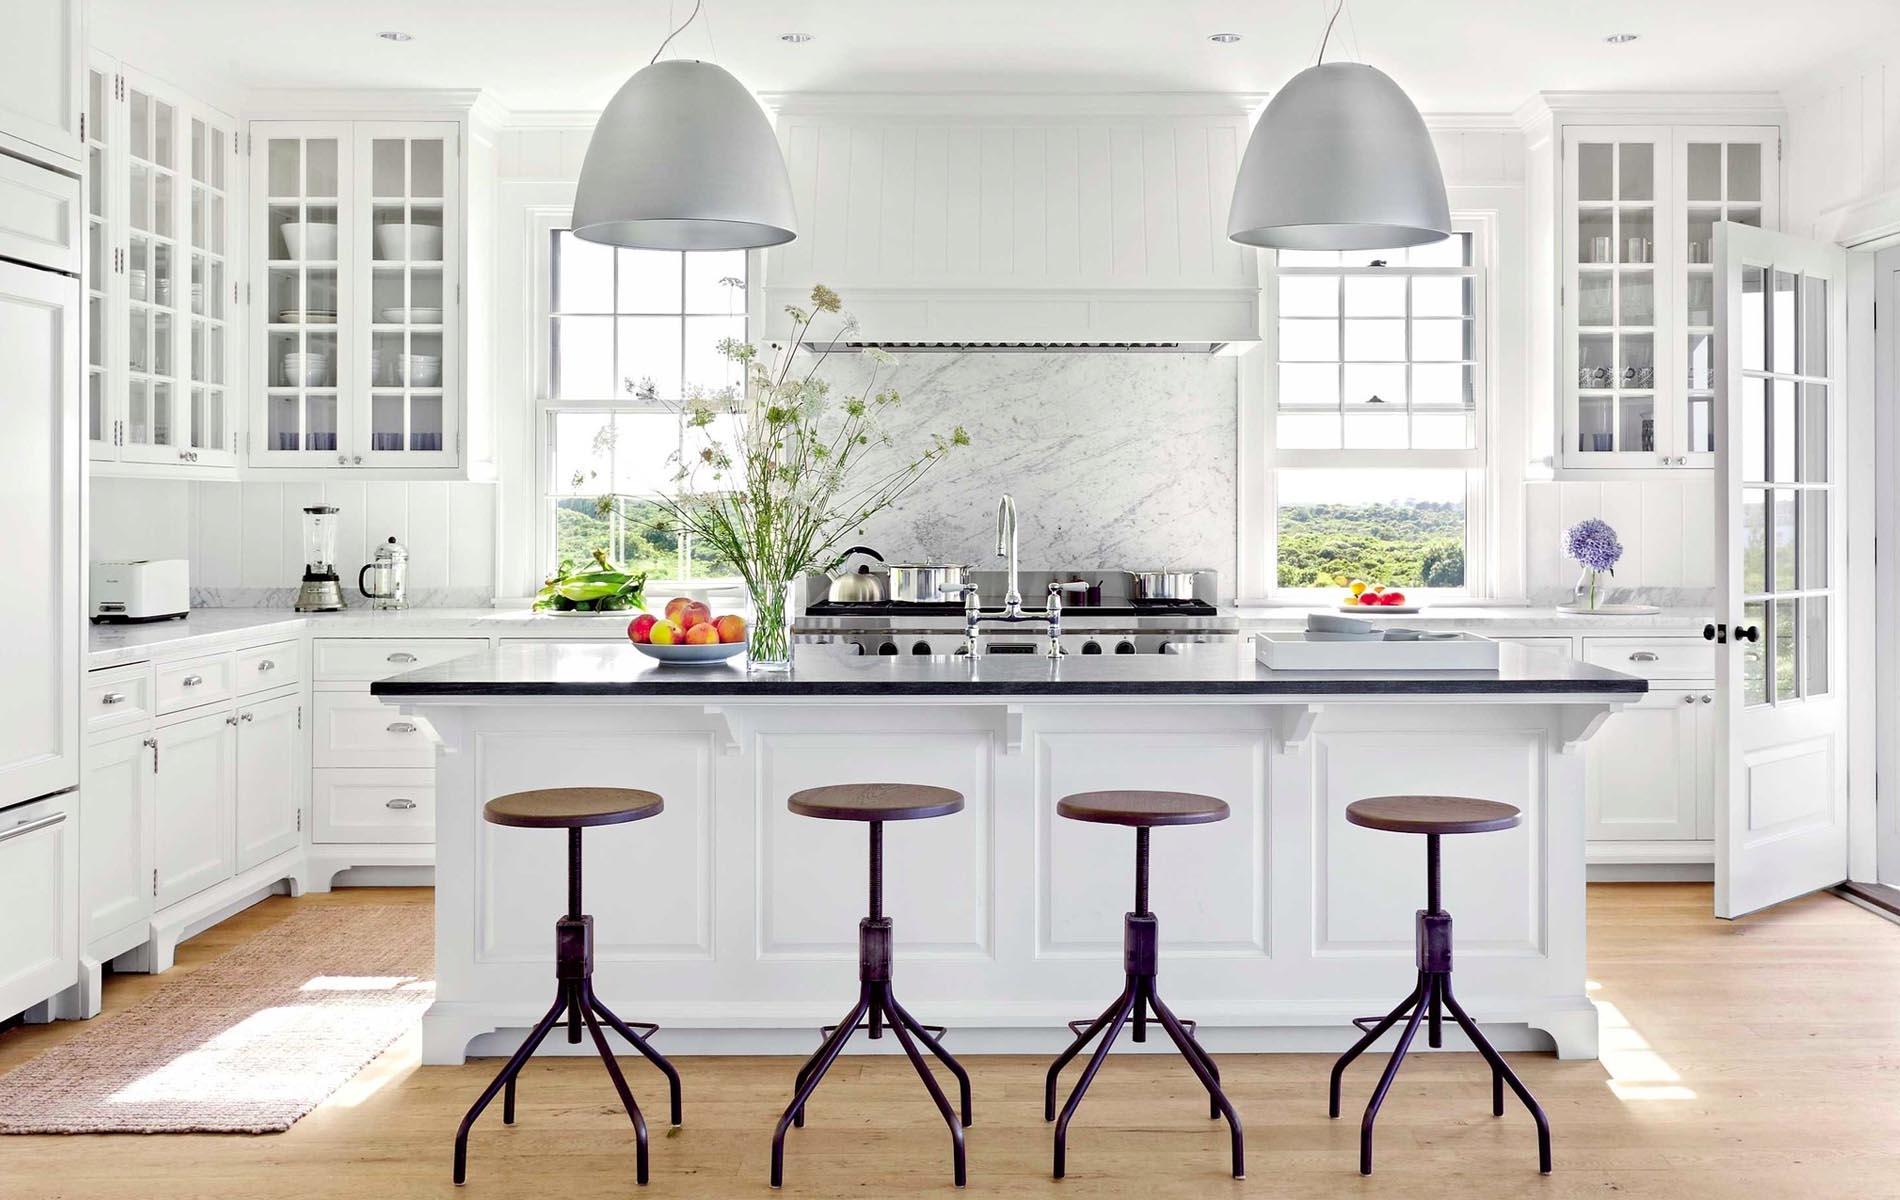 Cena obnova kuhinje mojmojster - Cuisine moderne images architectural digest ...